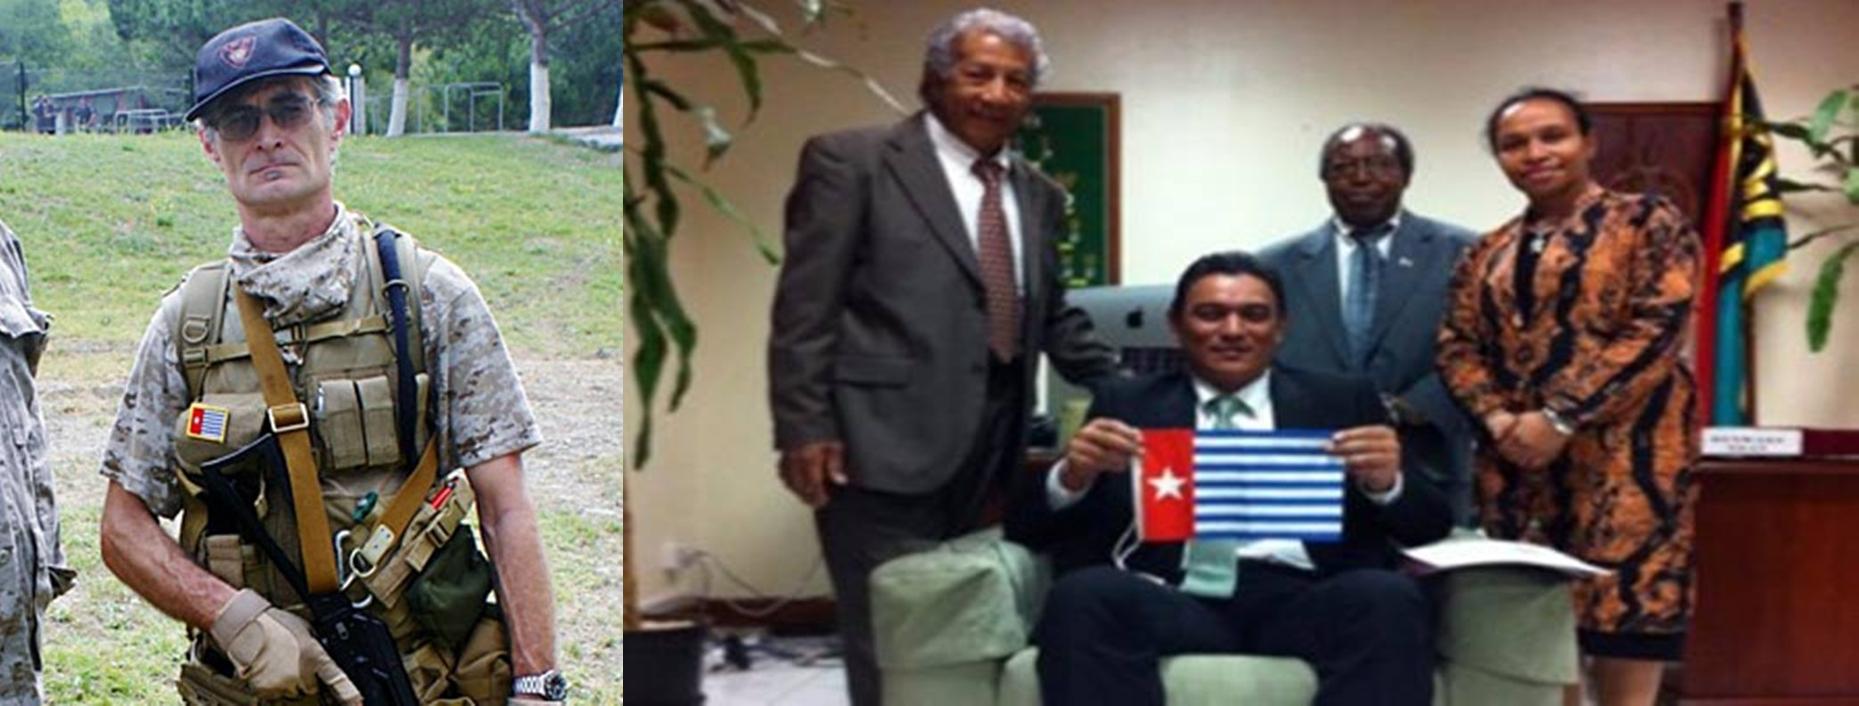 Pendukung Papua Merdeka